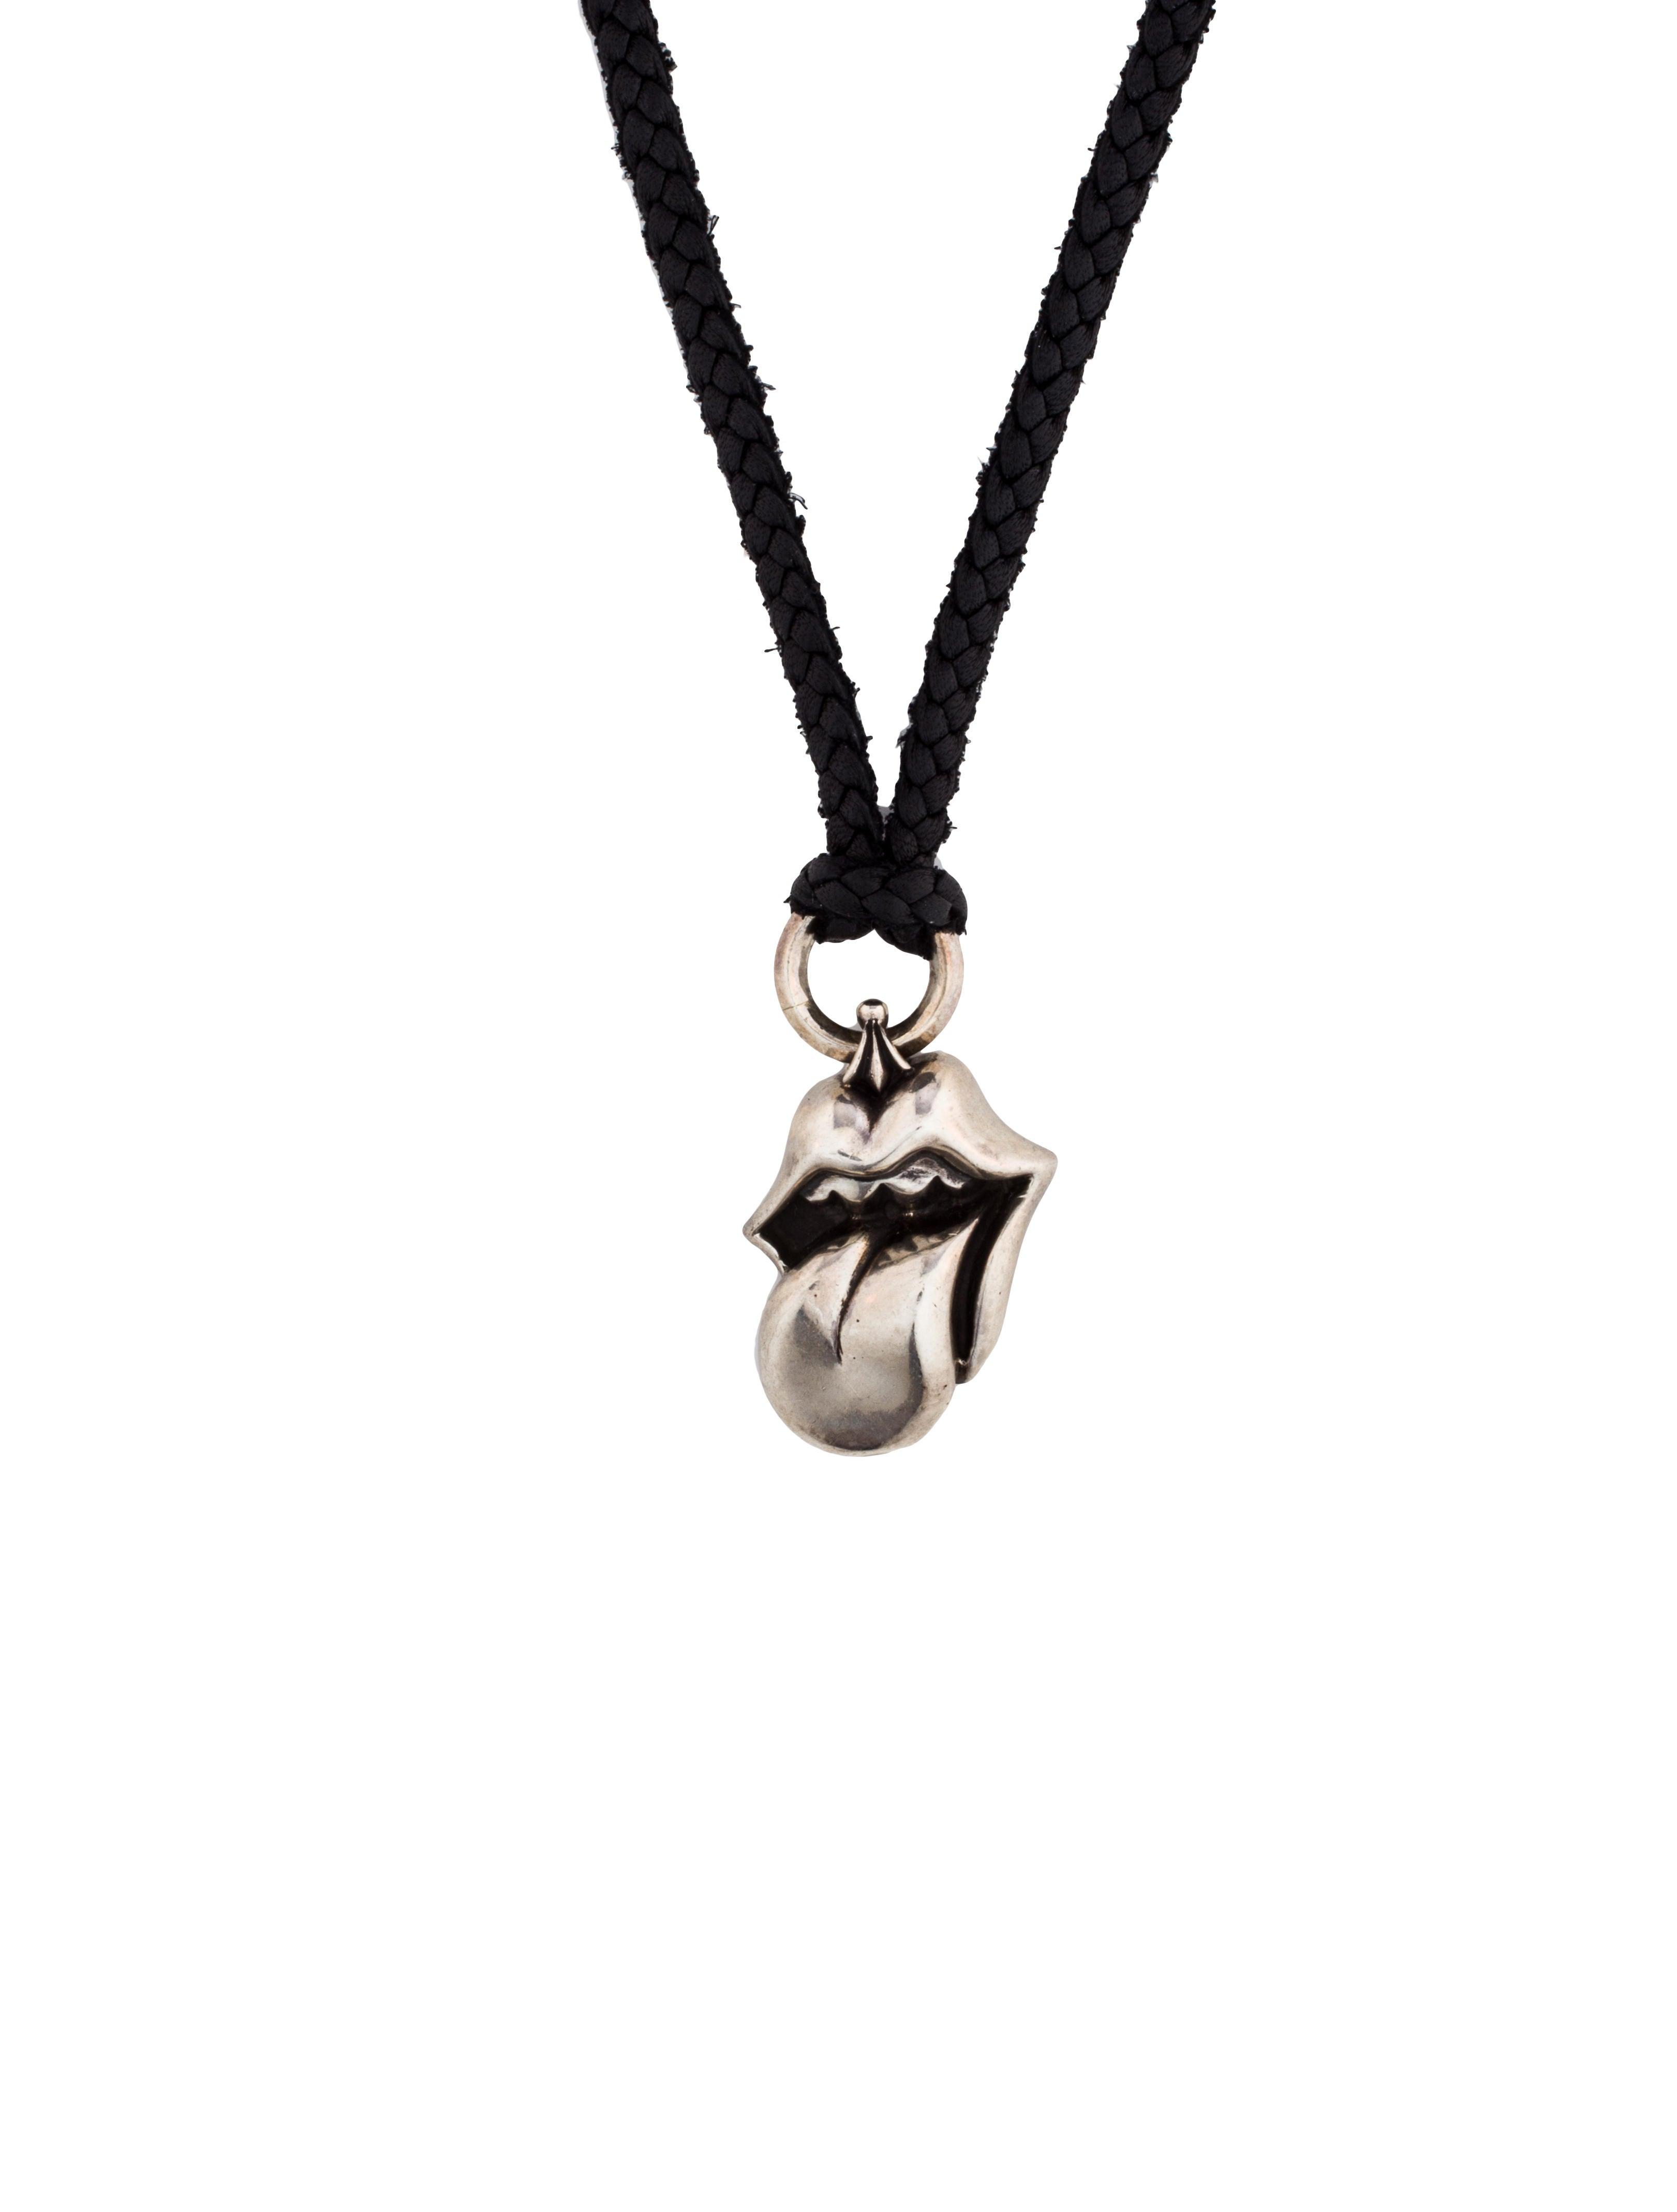 5909227ff917 Chrome Hearts Tongue   Lips Pendant Necklace - Necklaces - CHH21276 ...